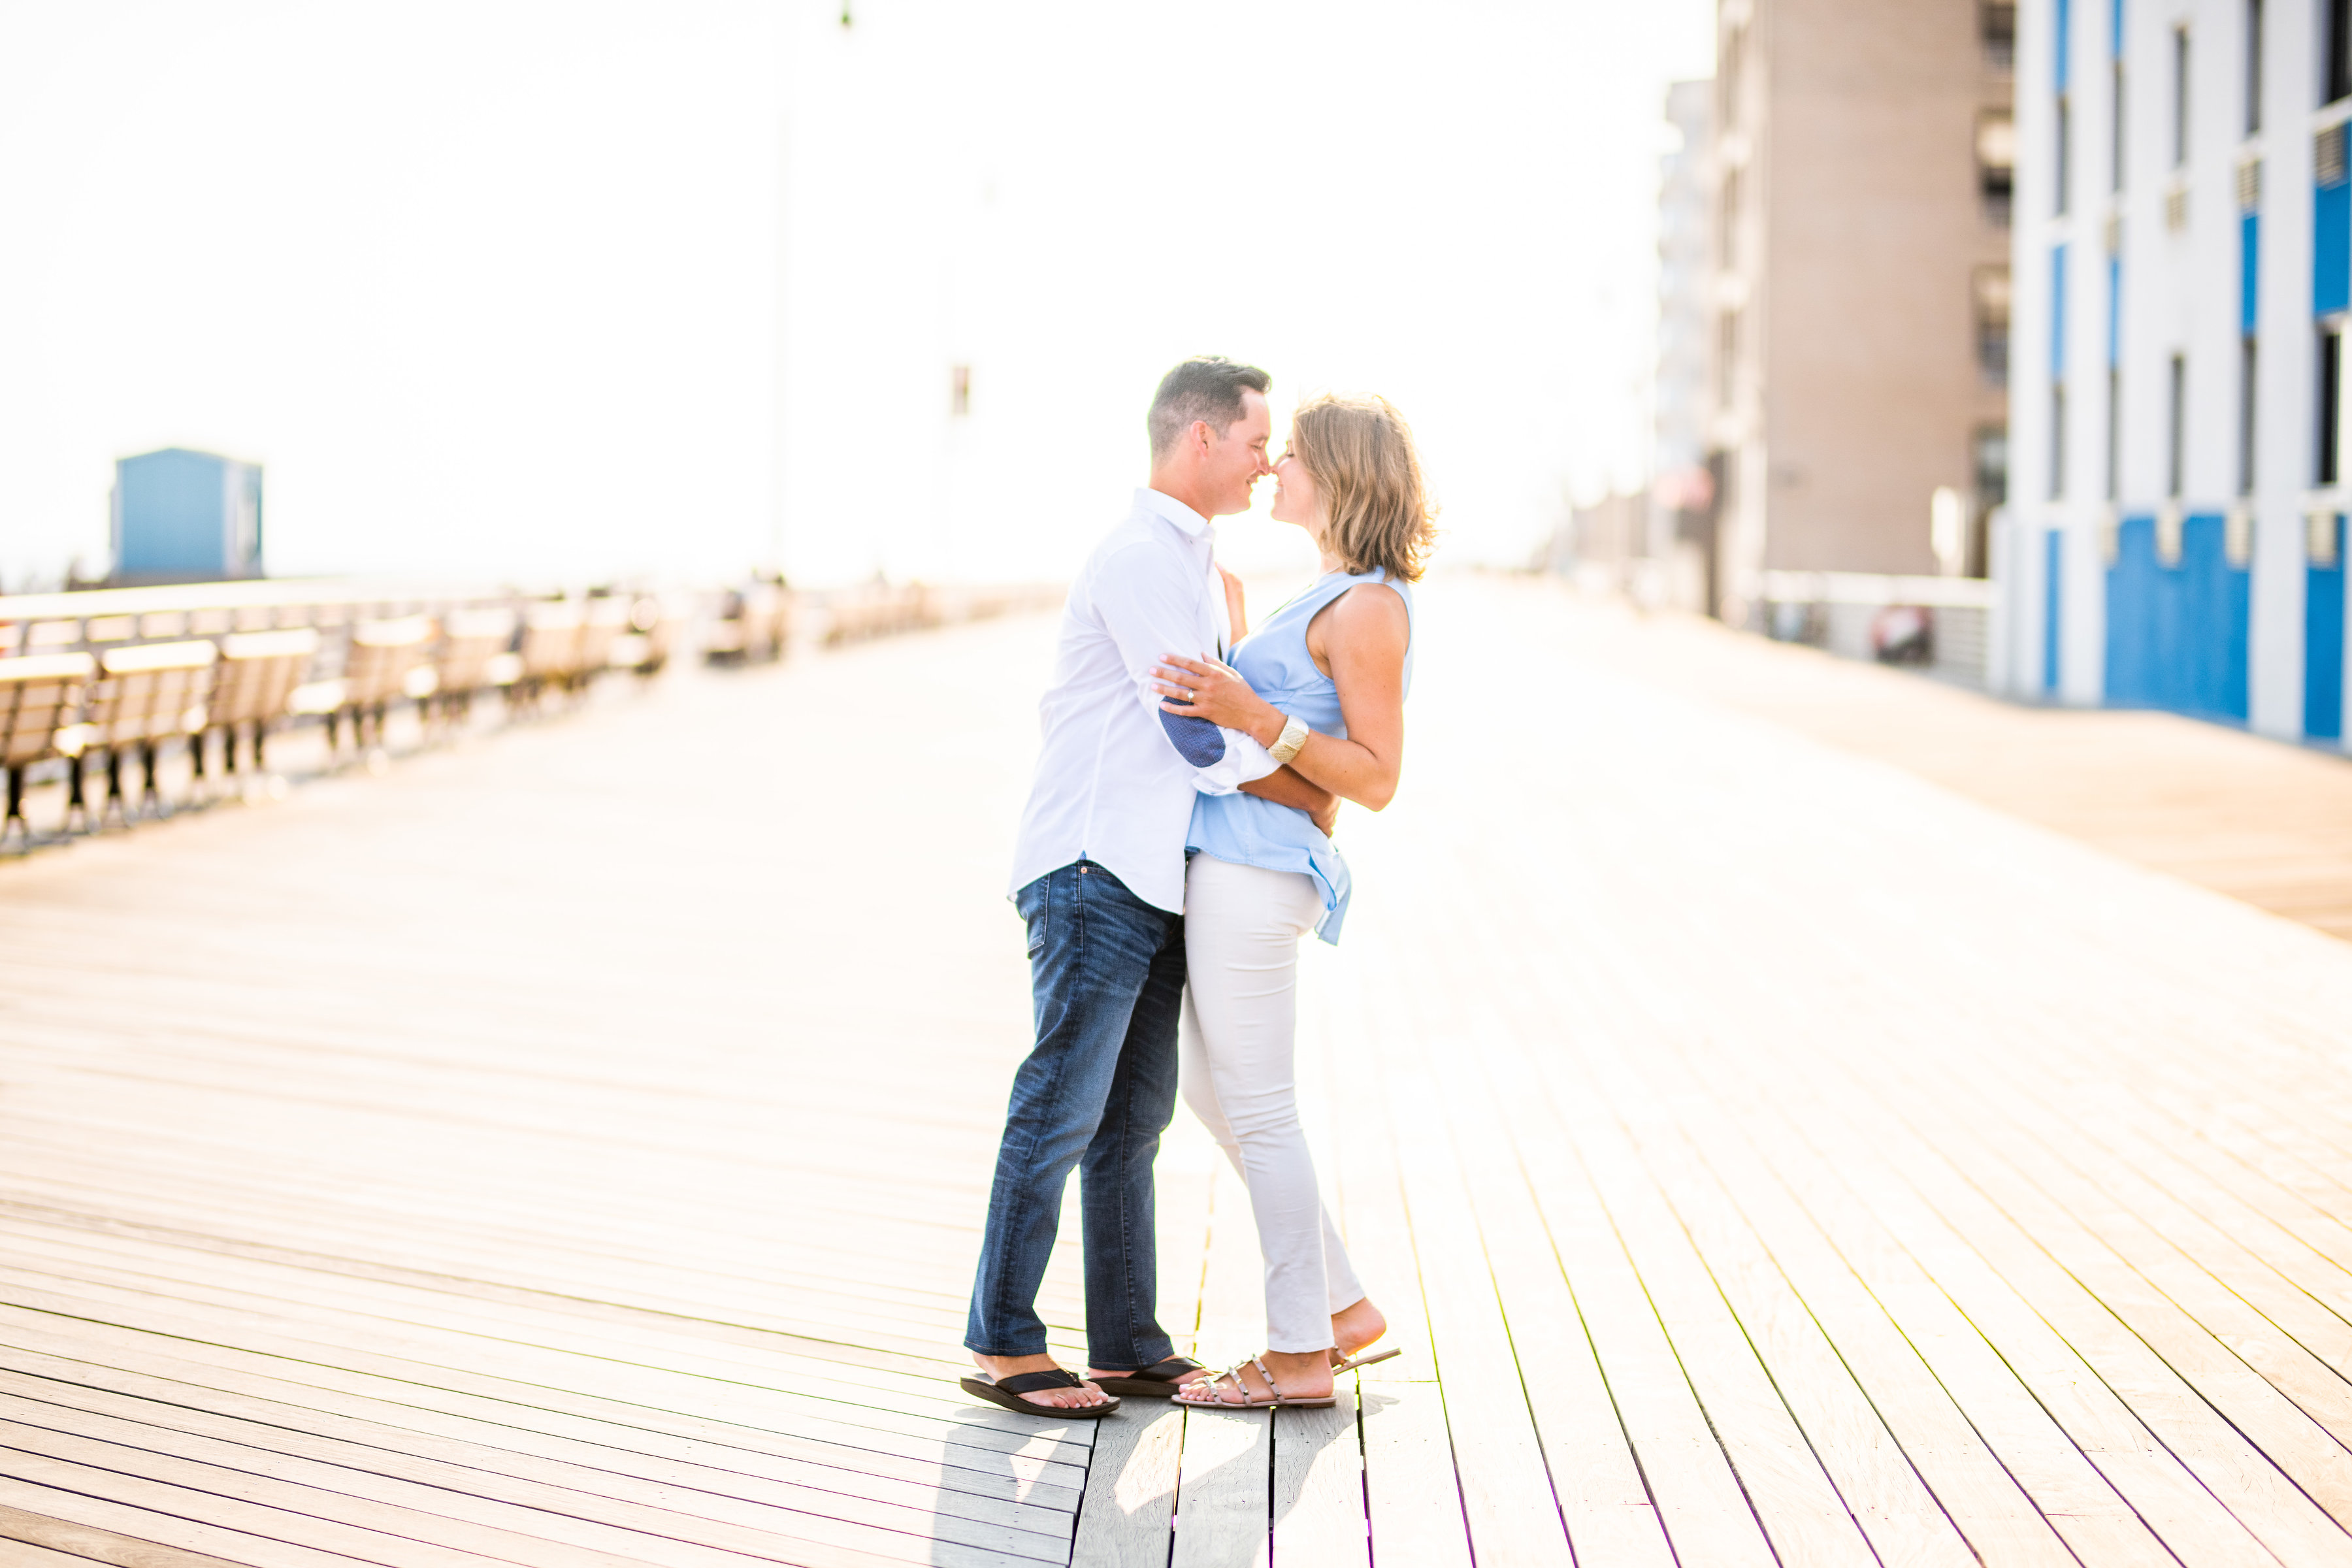 Long Beach NY Engagement Shoot | Long Beach Boardwalk Engagement Shoot | Long Island Wedding Photographer 19